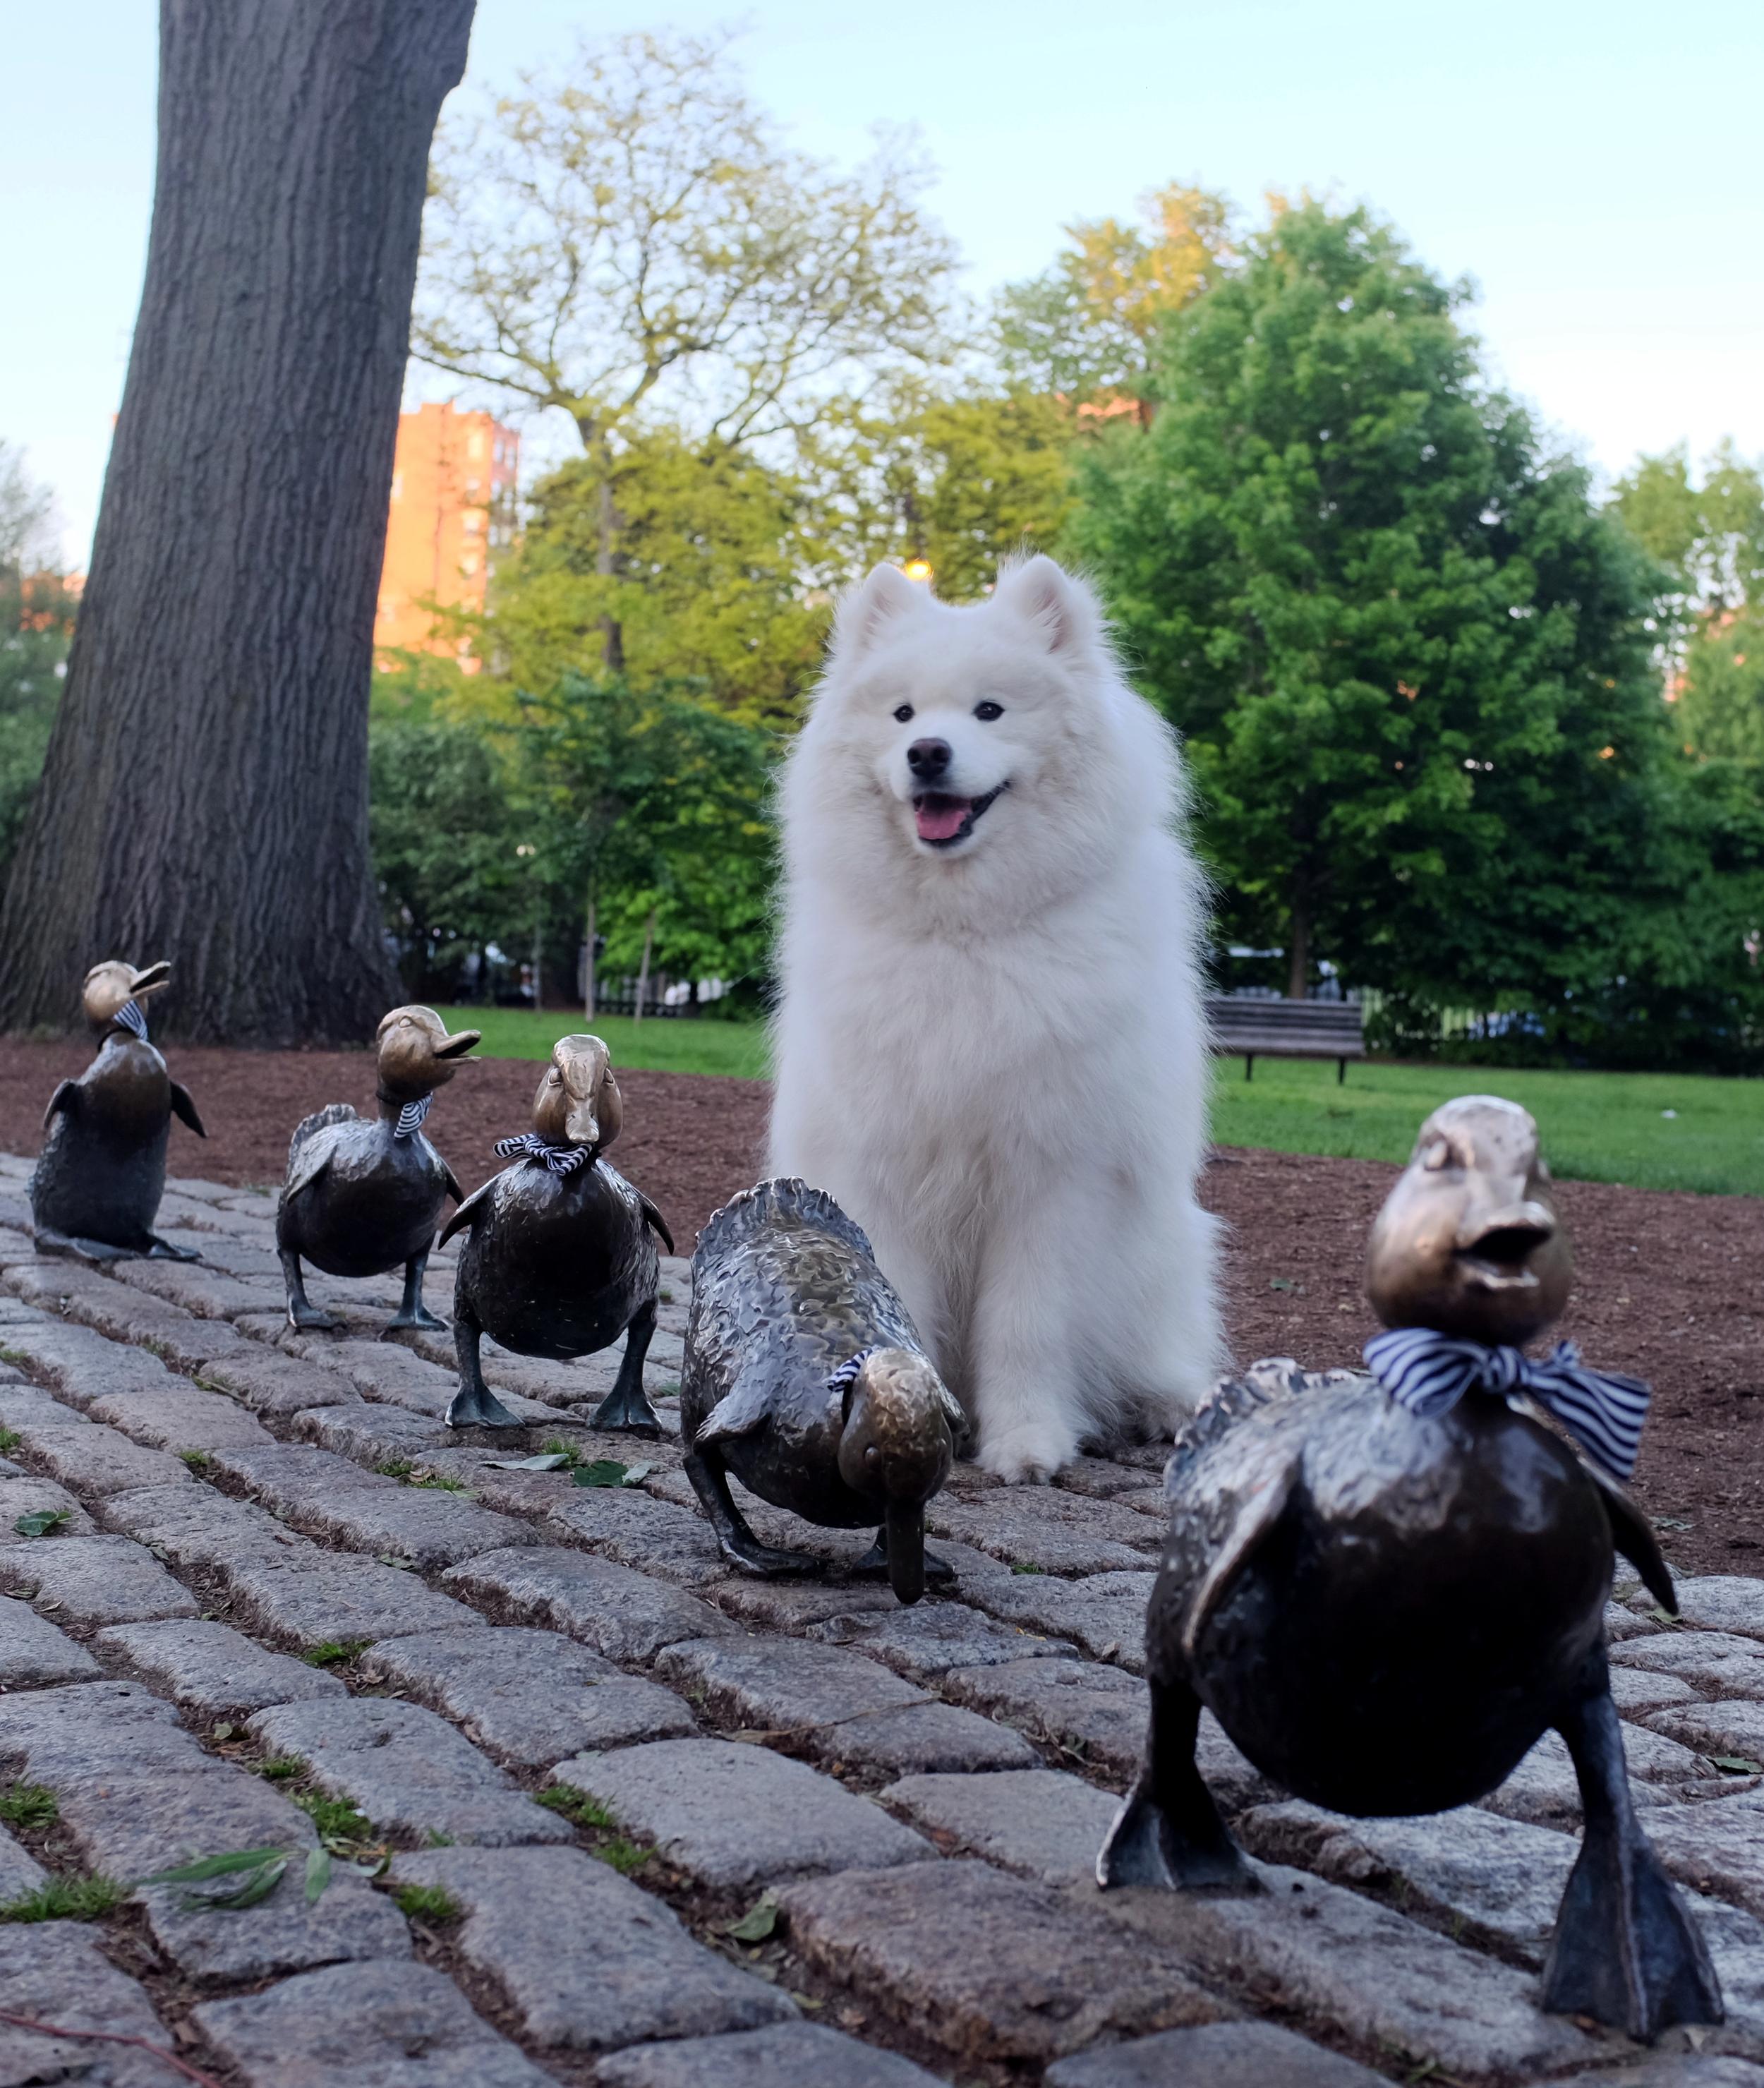 Make Way for Ducklings statue, Boston Public Garden